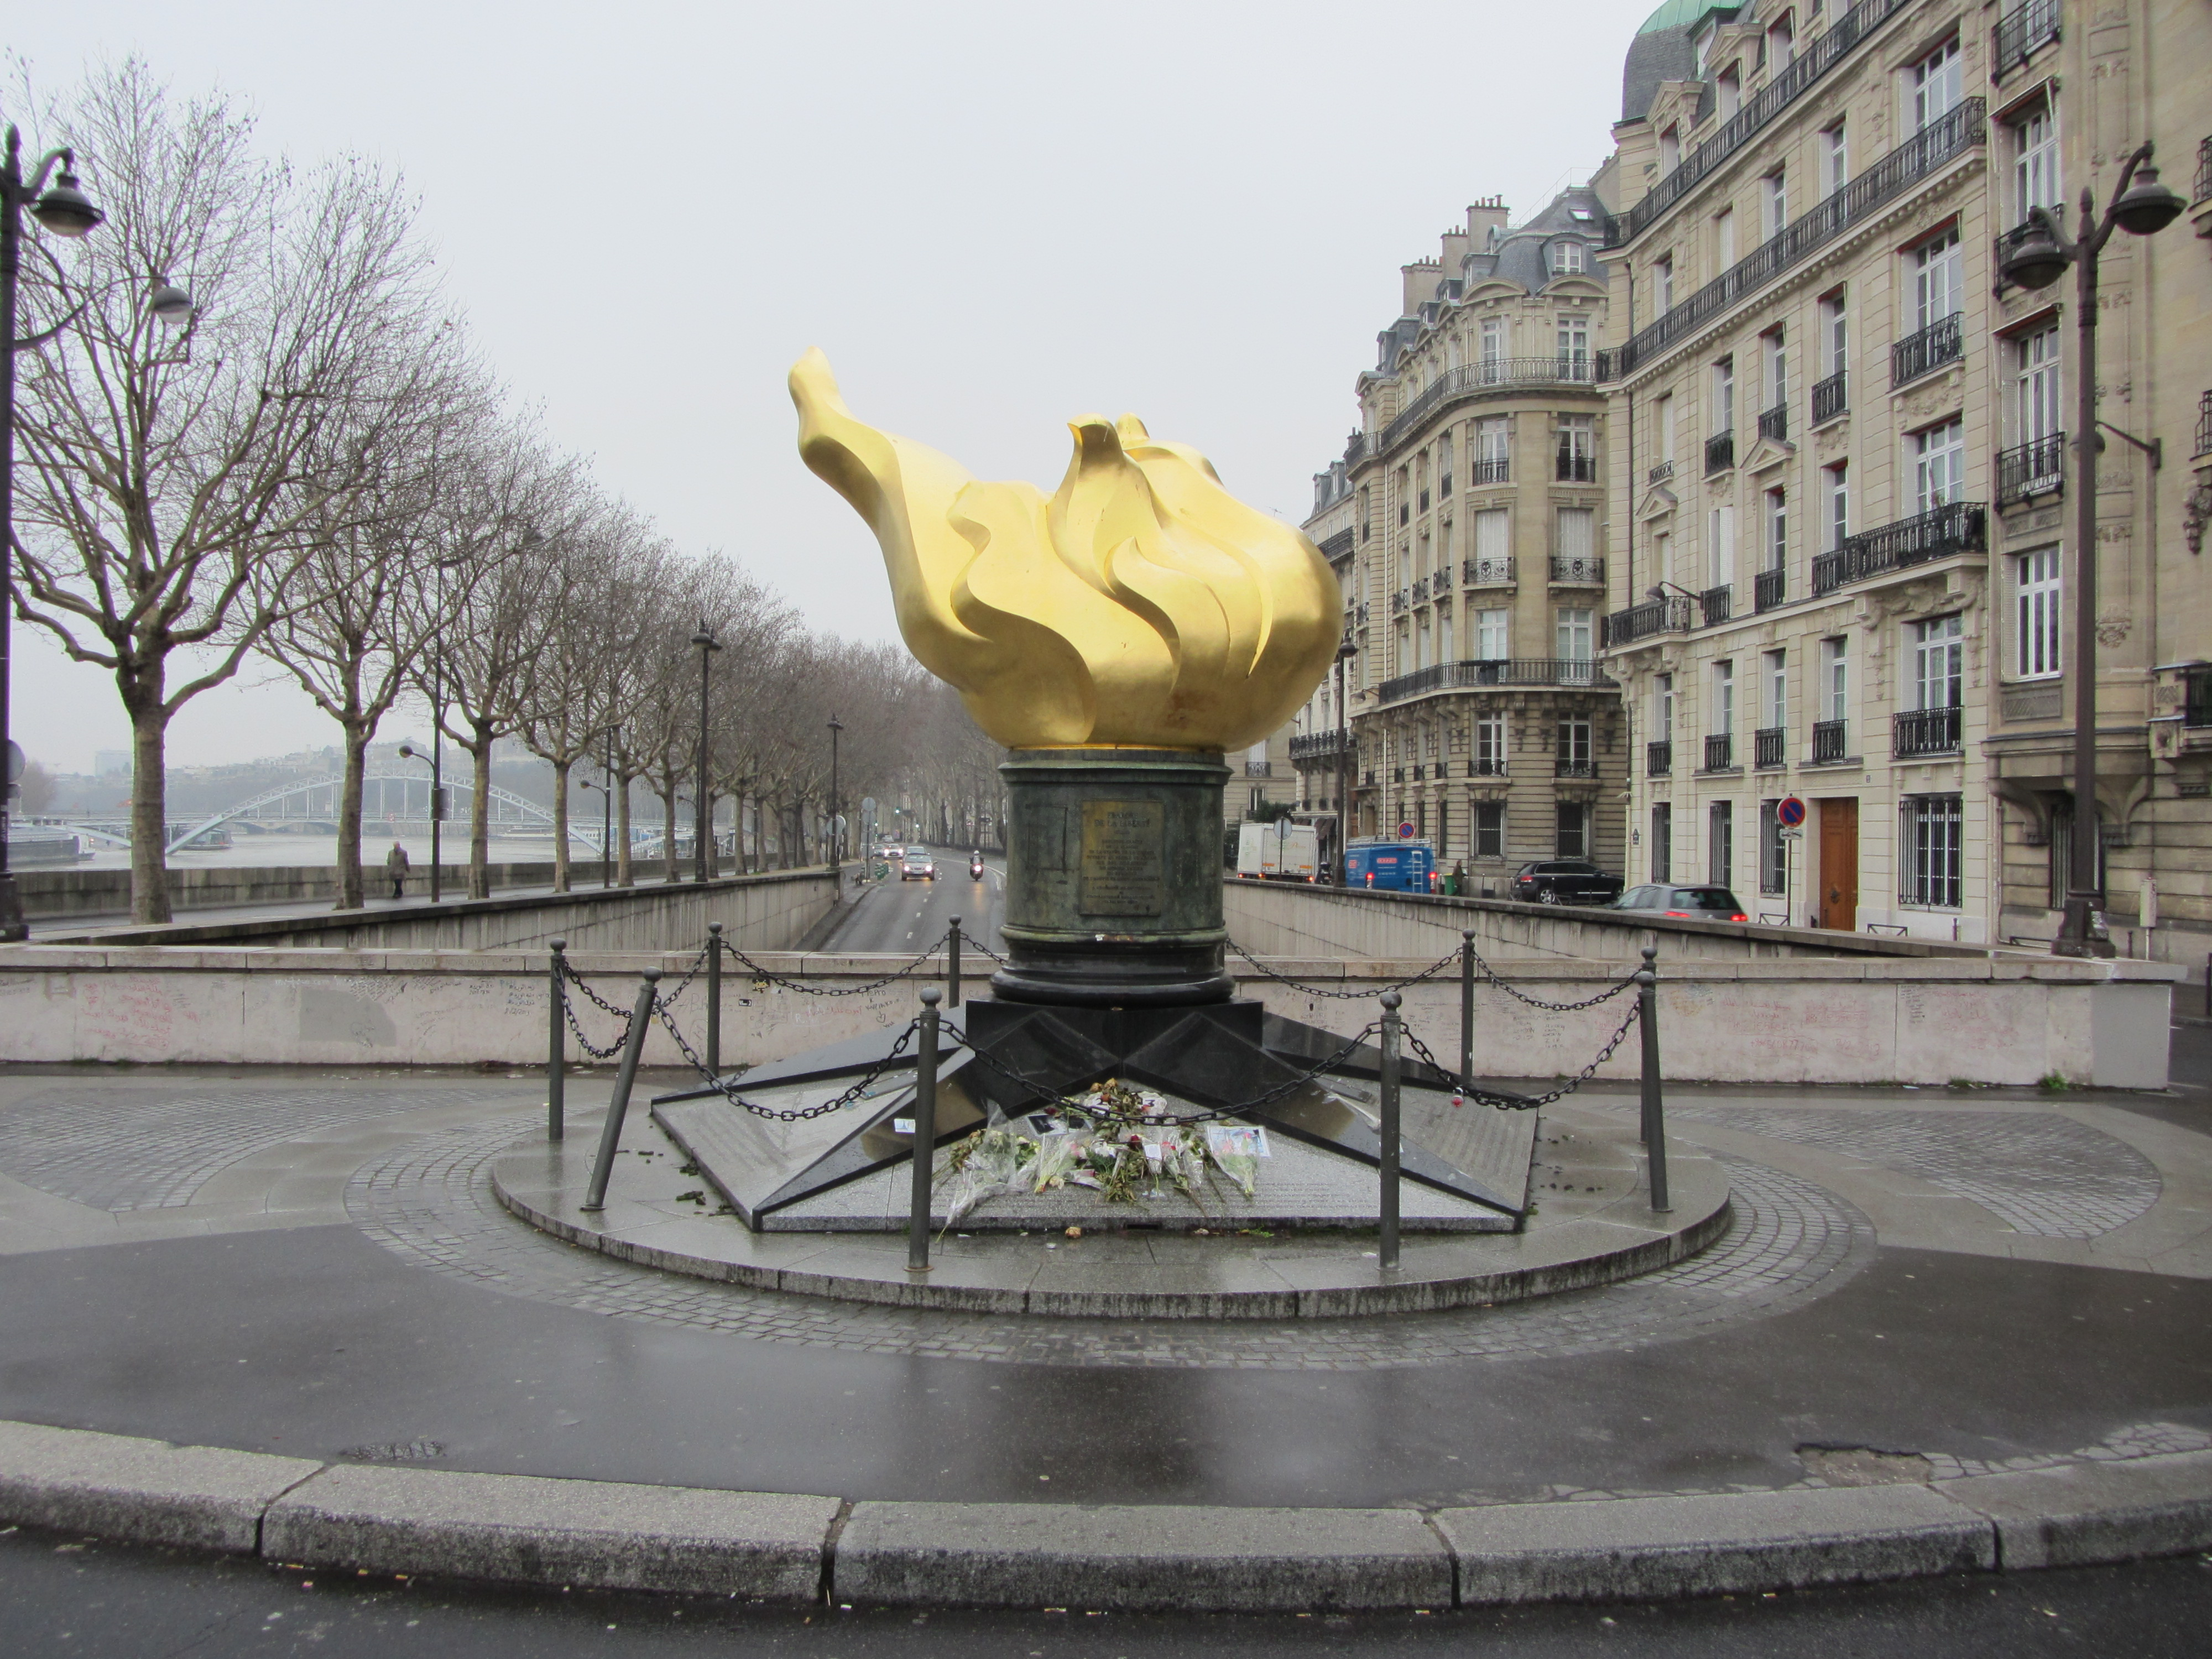 Paris, France - Chic Darling